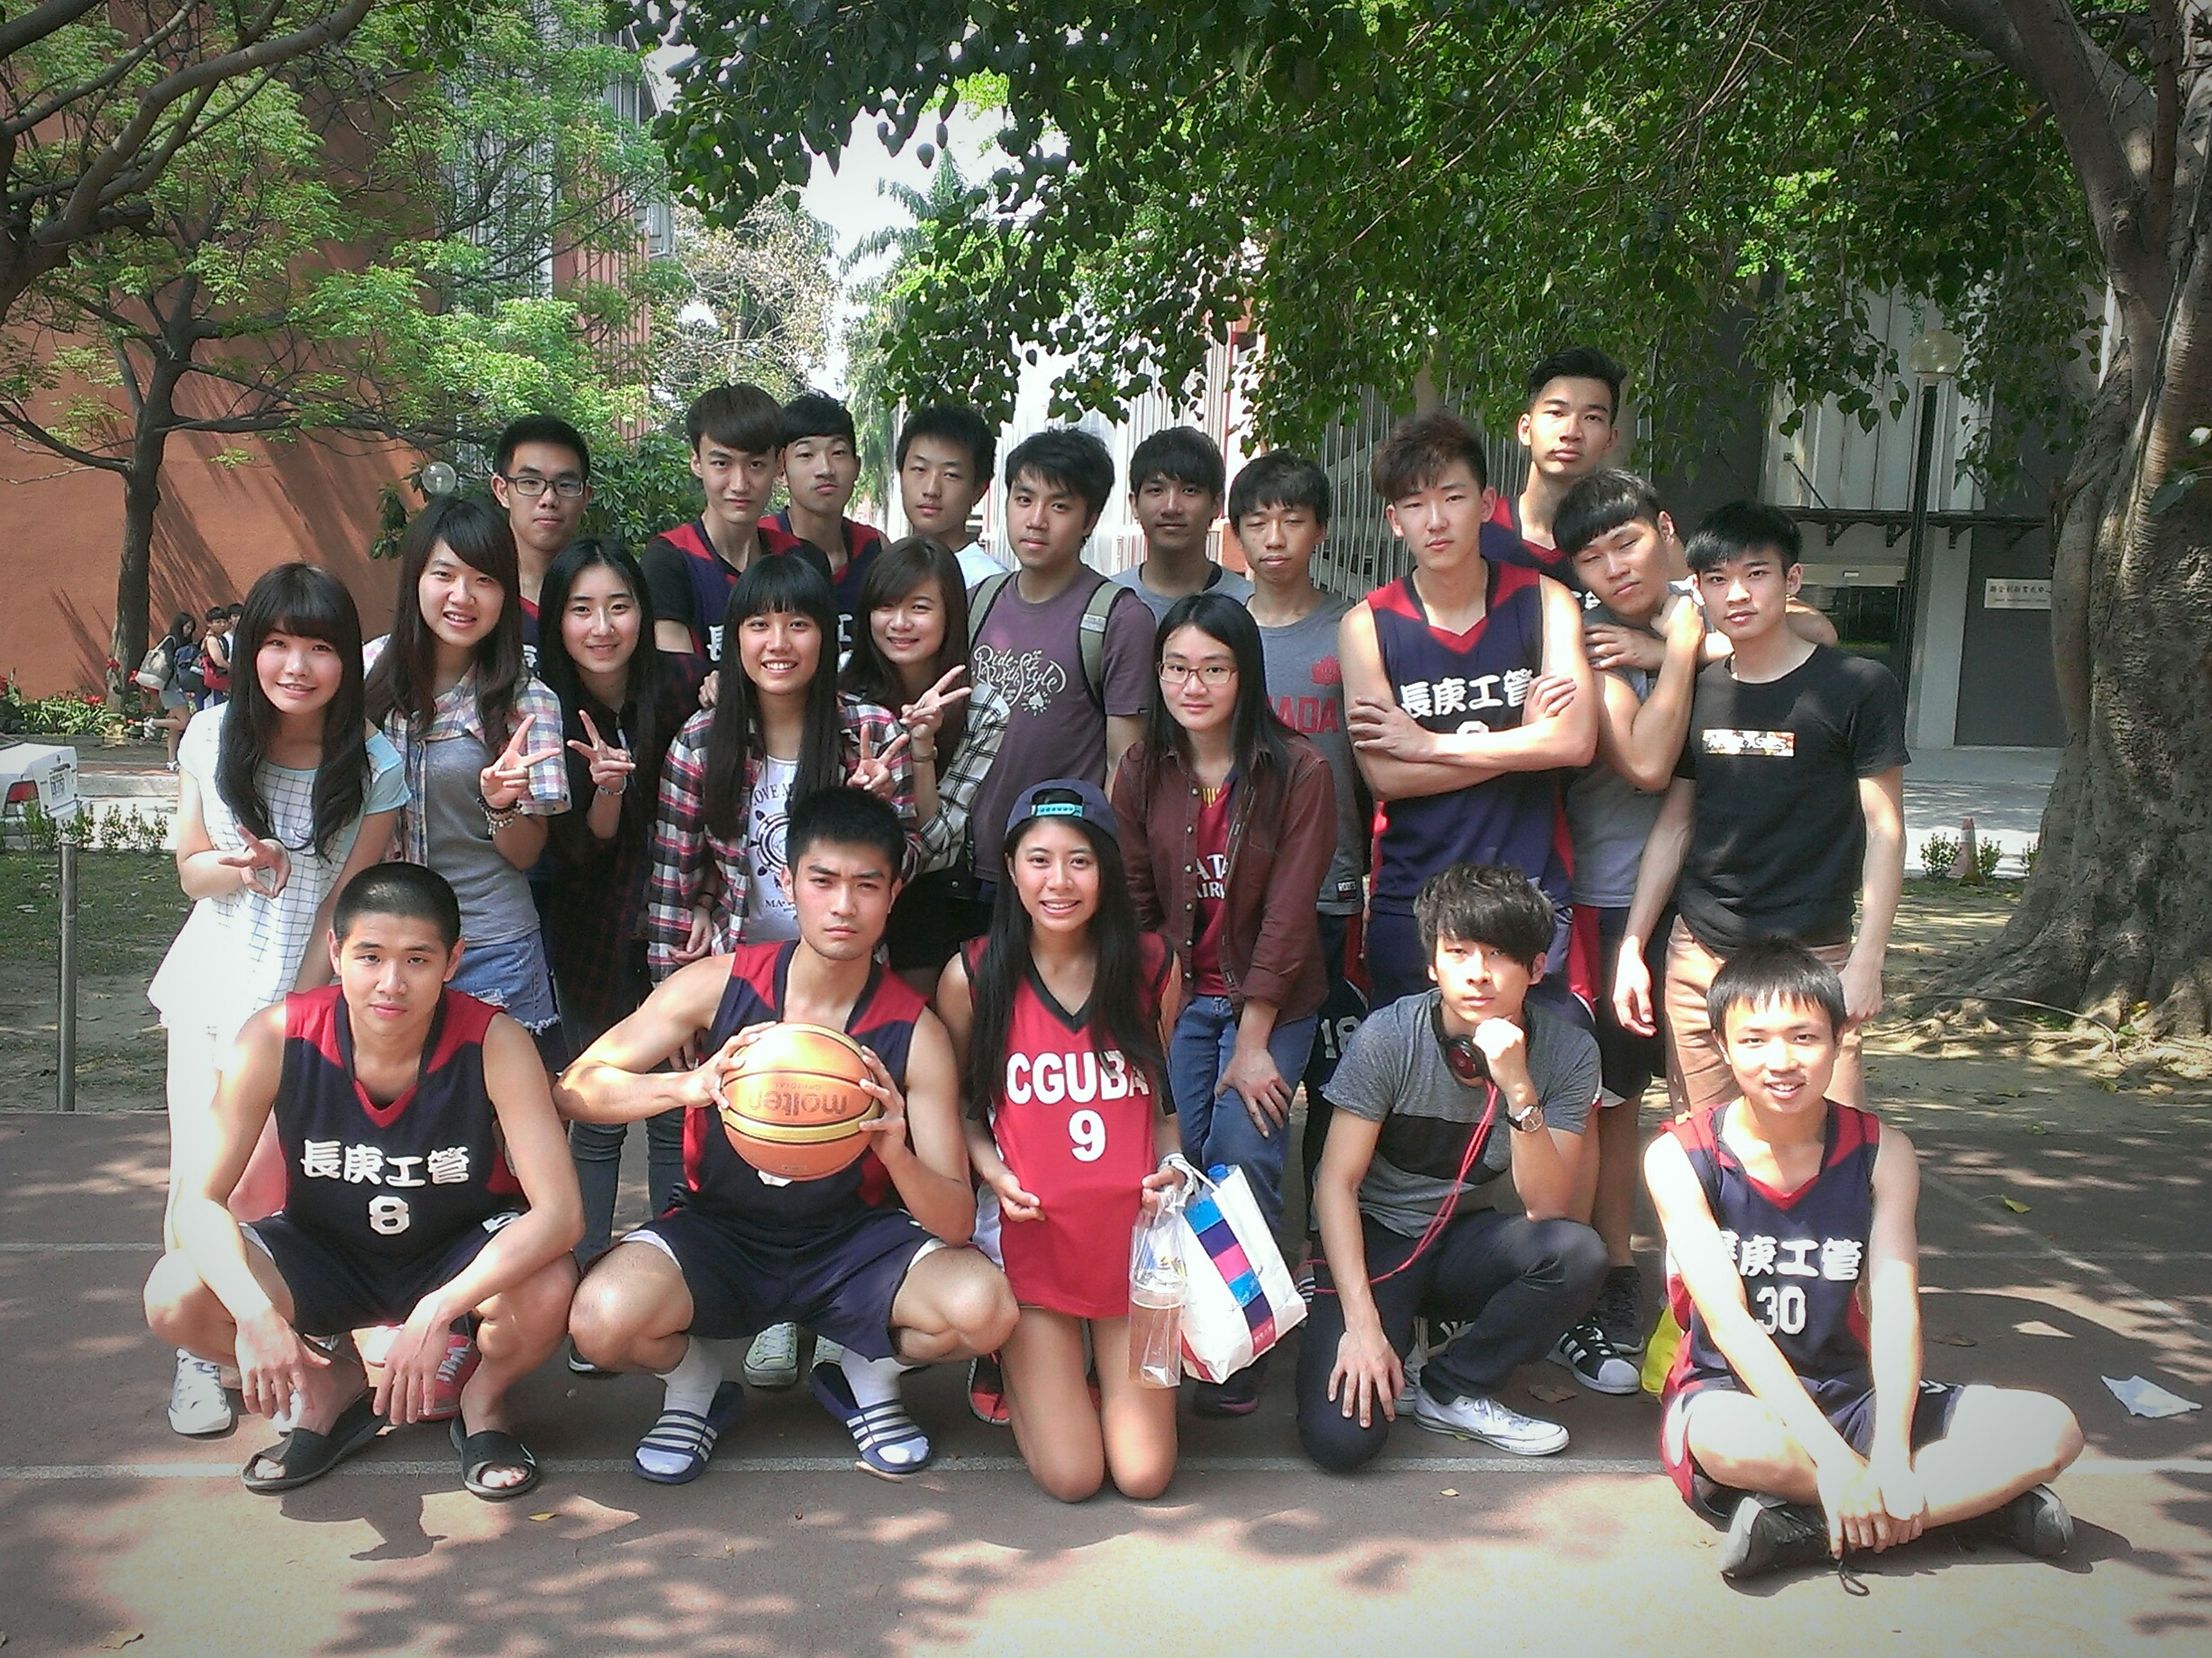 大工盃 Basketball CUGBA Fever B.A.B.T